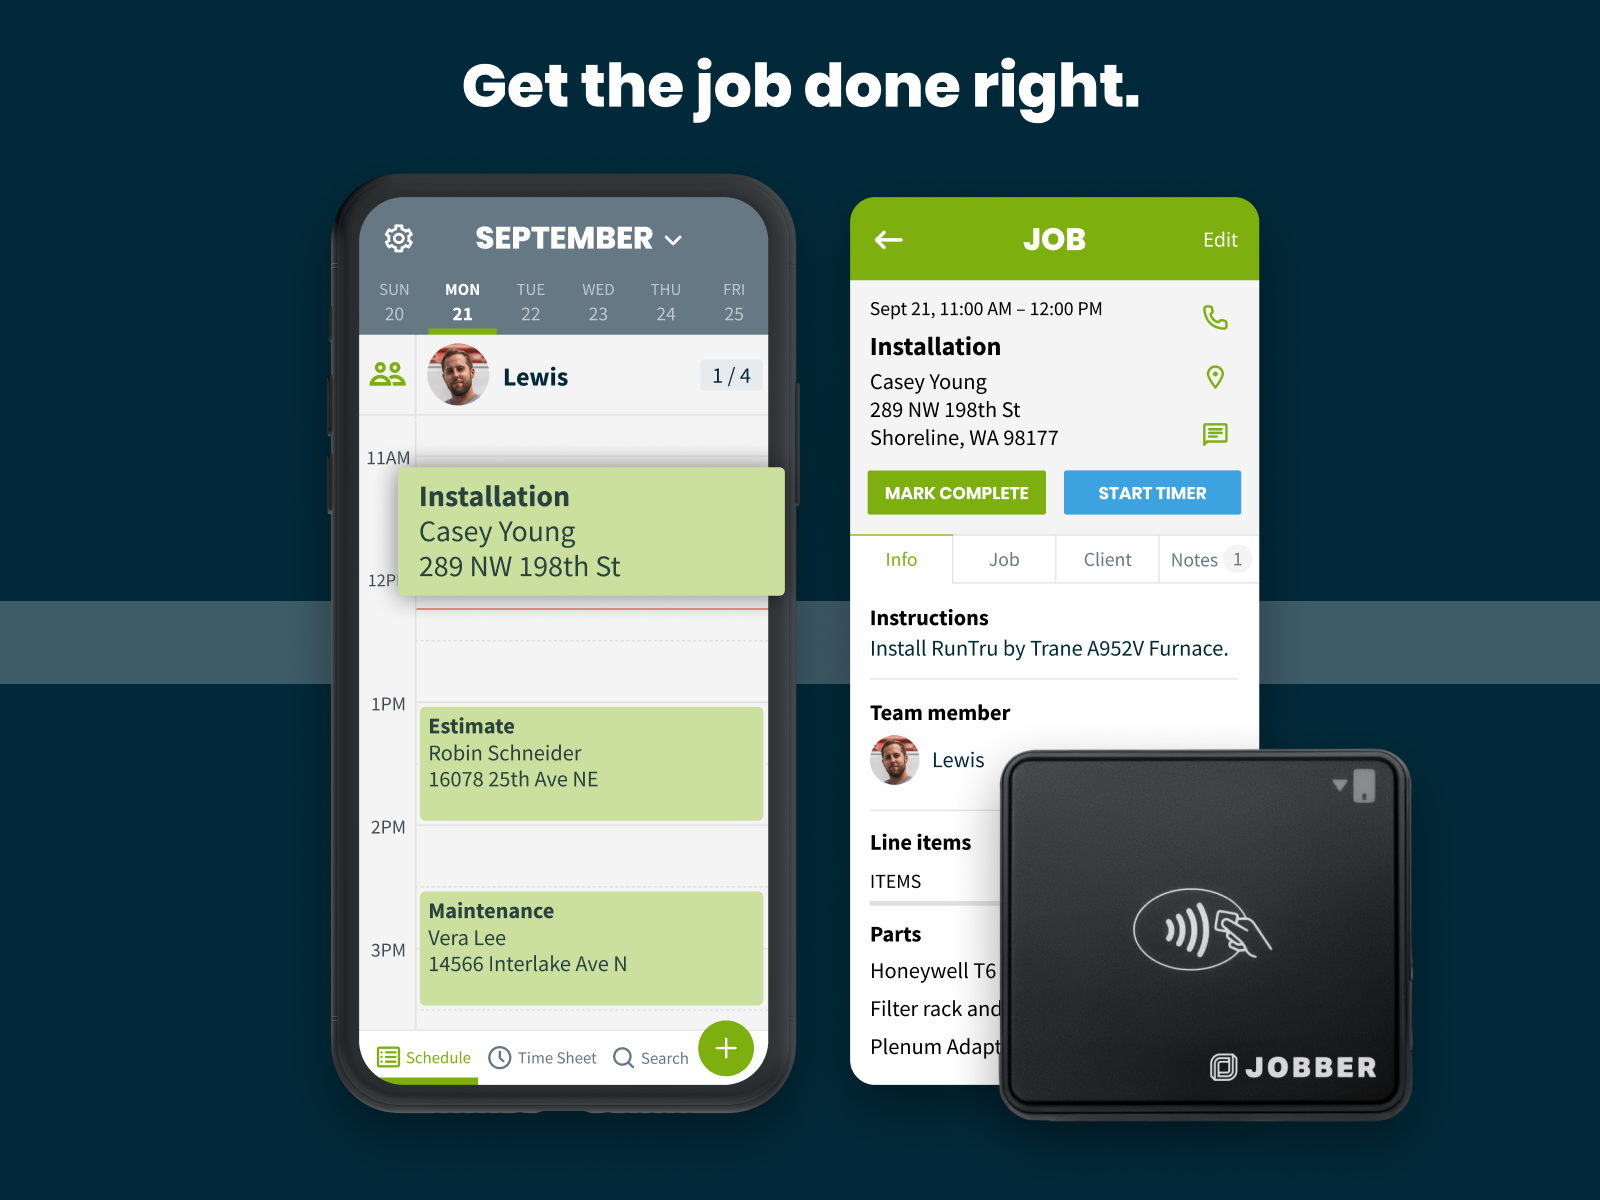 Jobber Software - Complete the job.